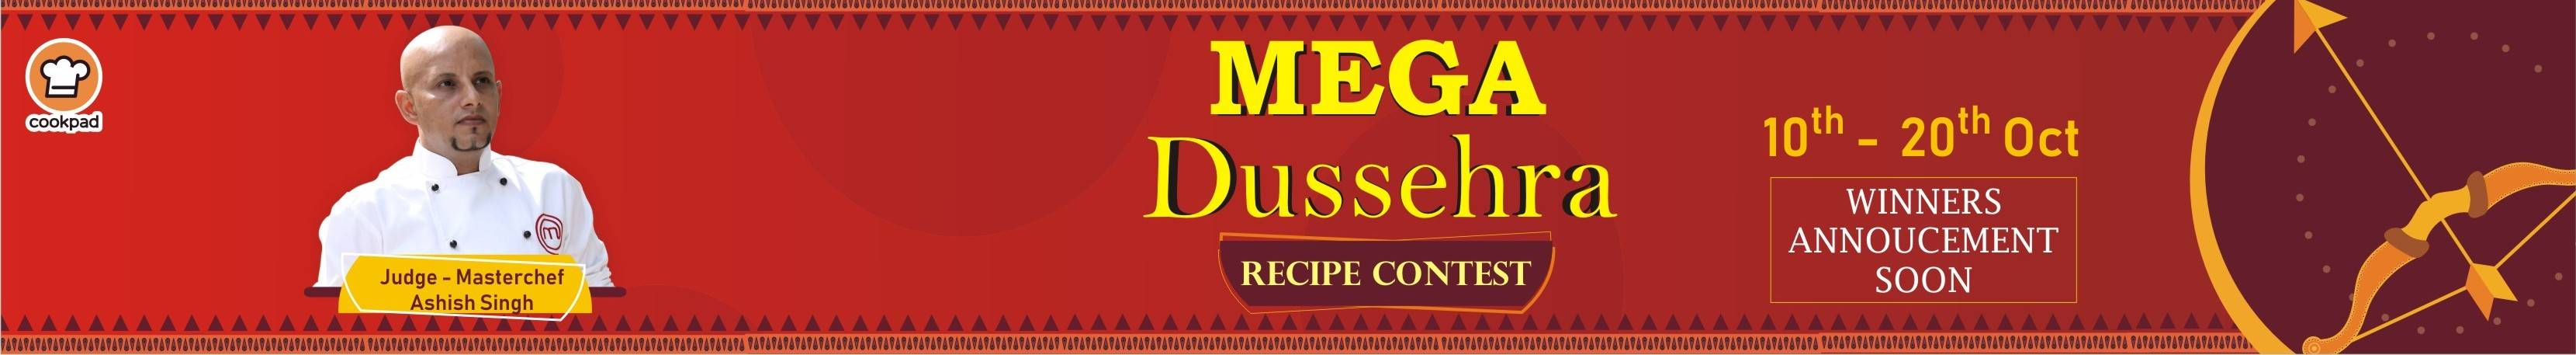 Mega Dussehra